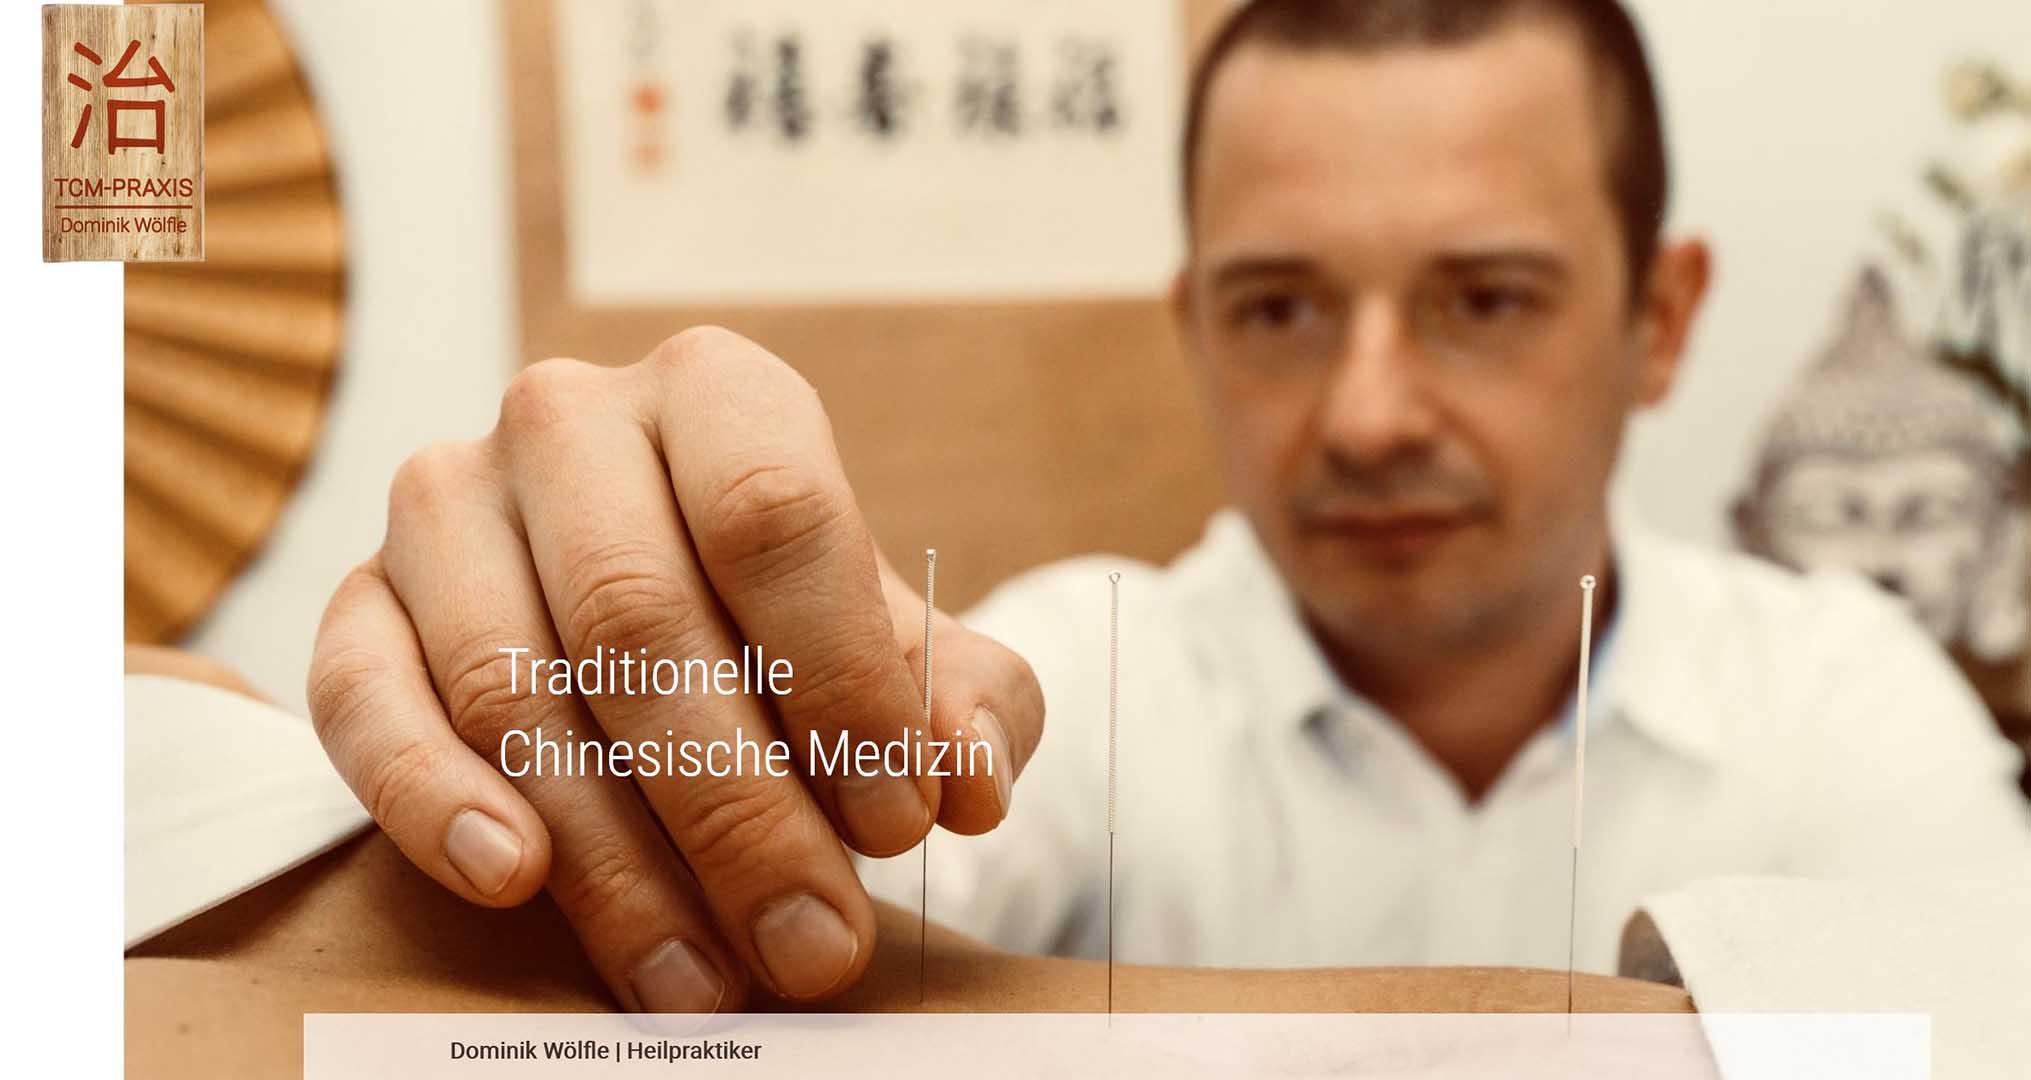 firmenfotos-businessfotos-fotograf-weinheim-mannheim-heidelberg